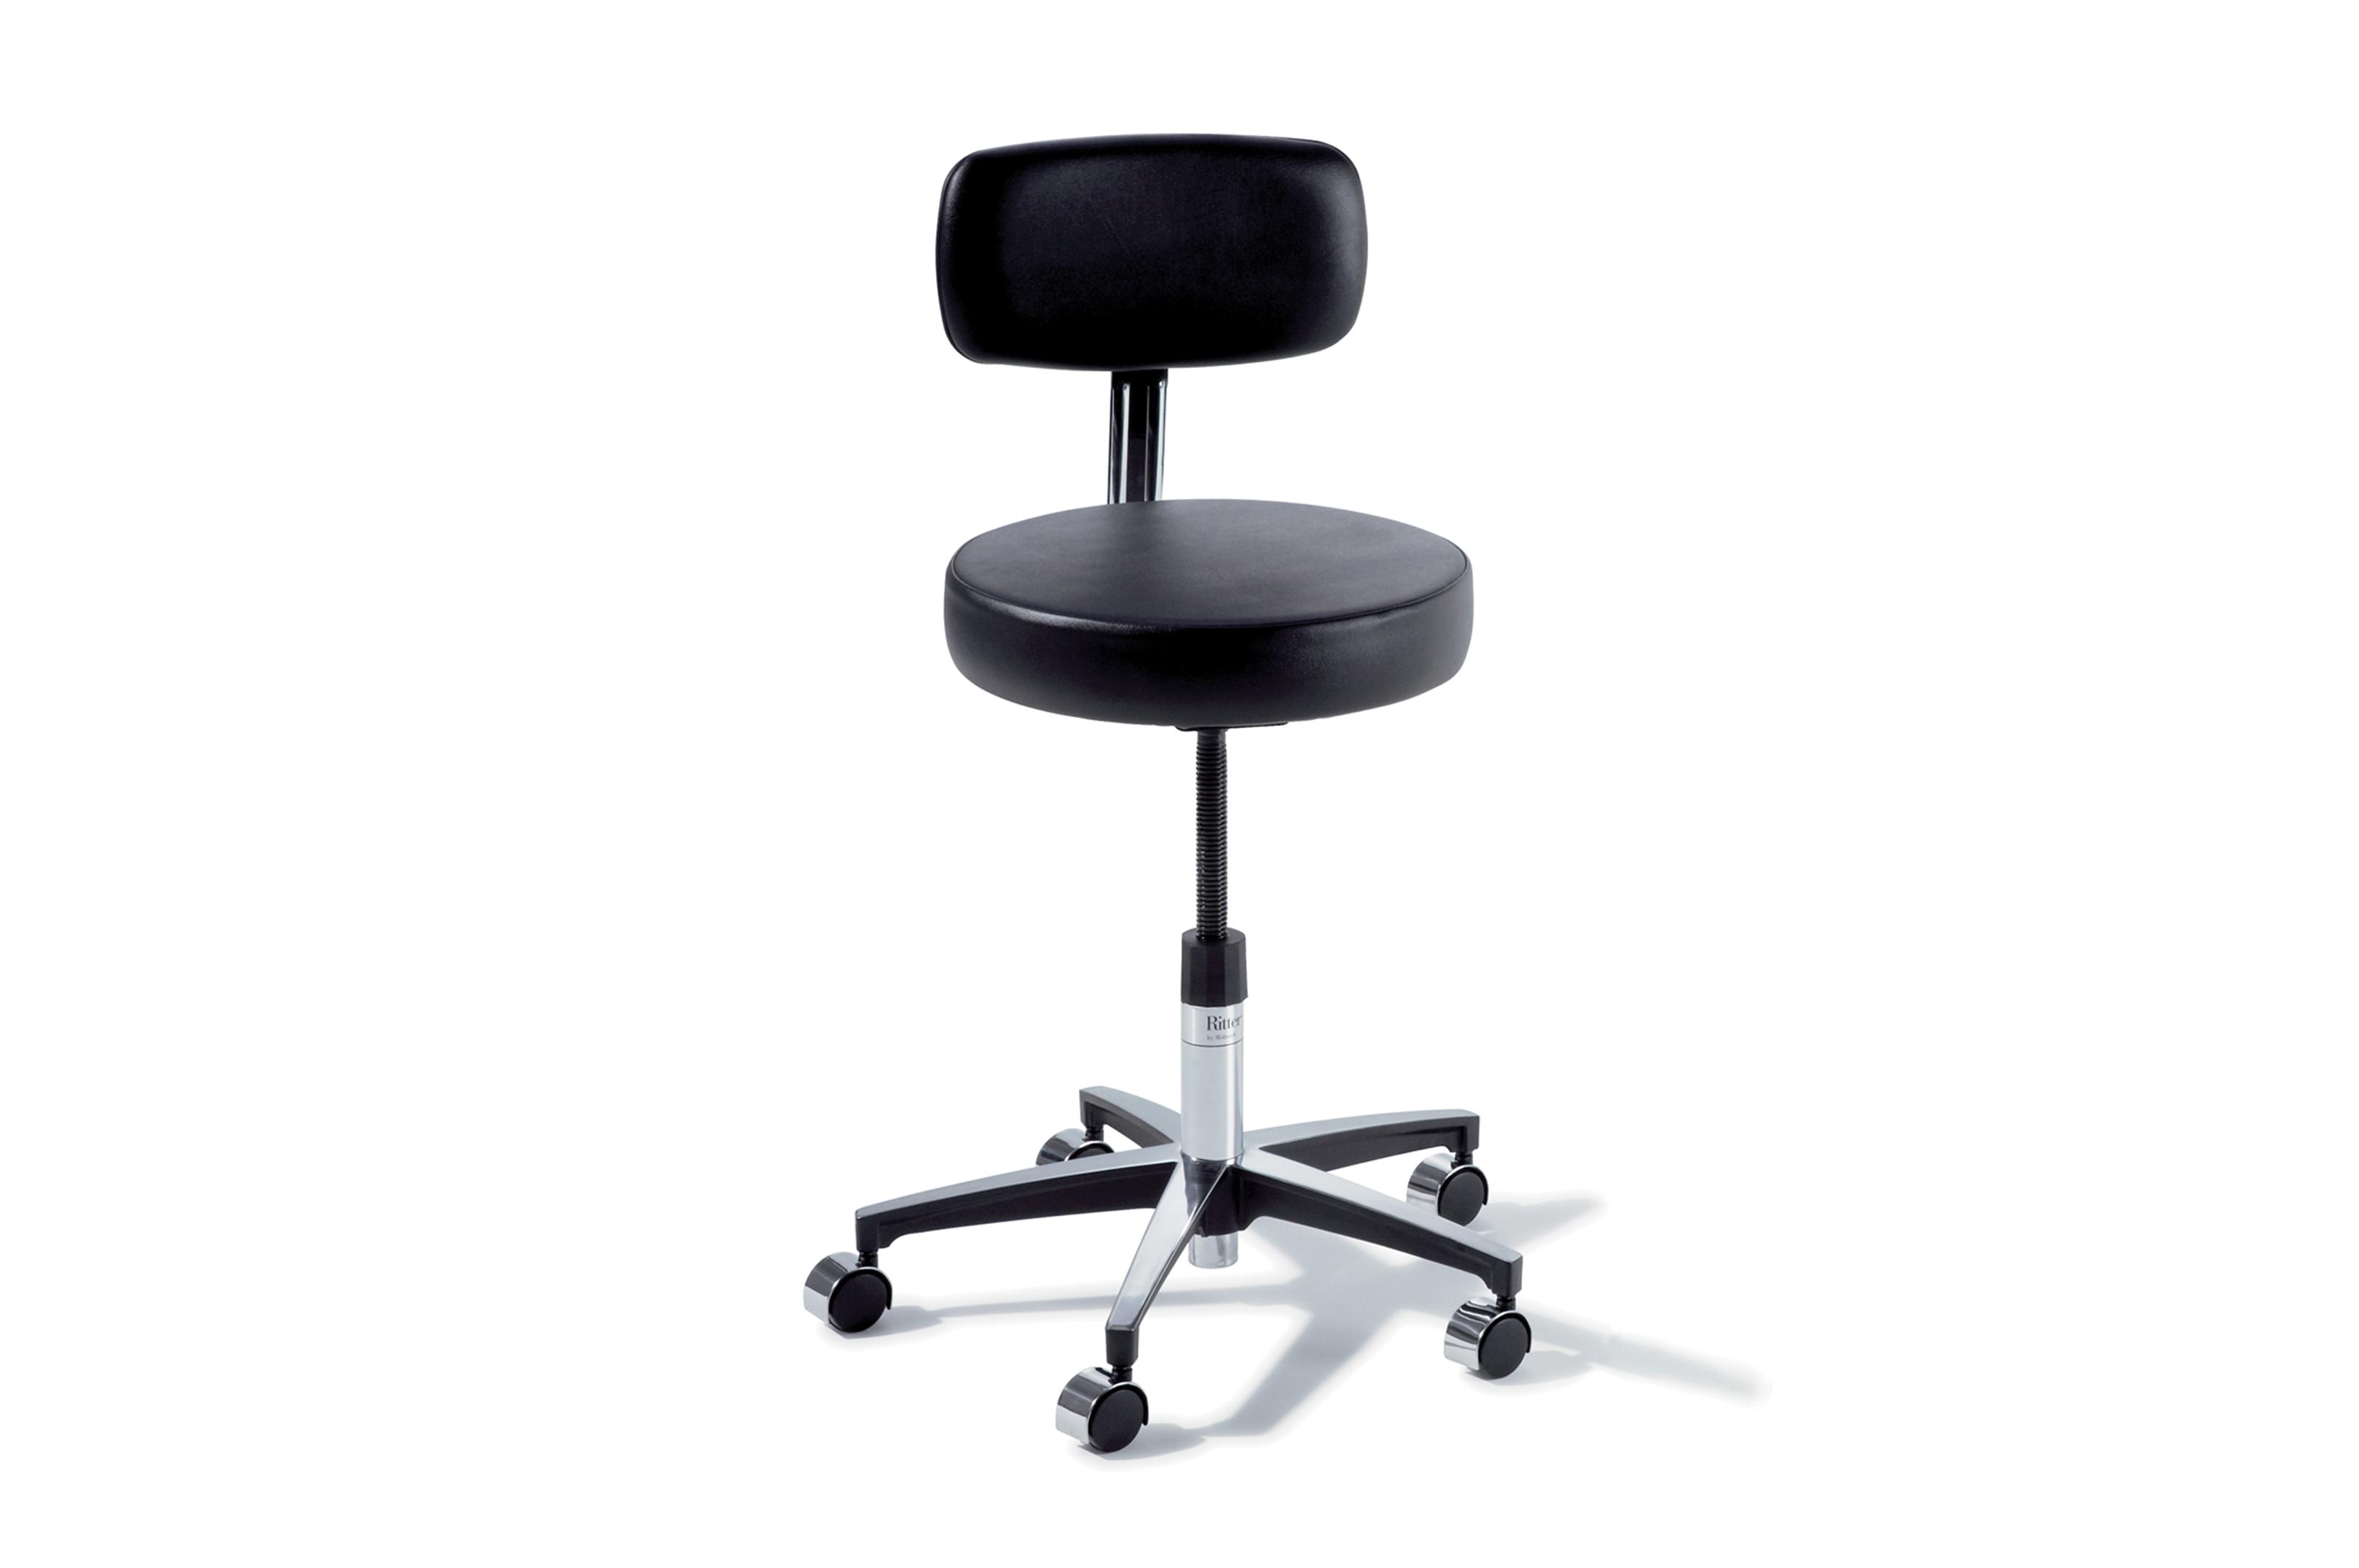 midmark-275-adjustable-physician-stool-back